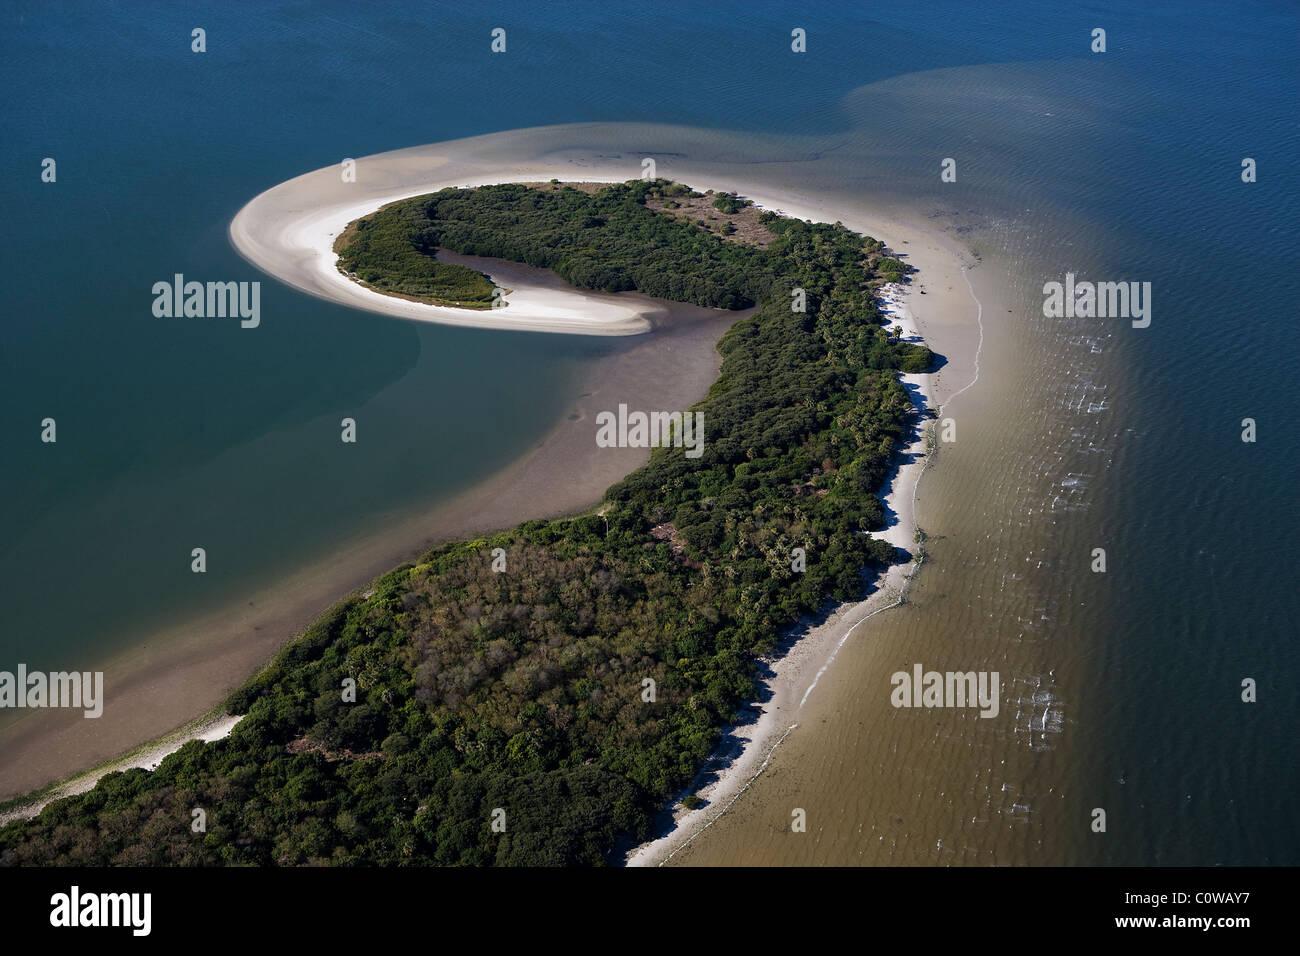 aerial view above sand bar Tampa bay Florida - Stock Image